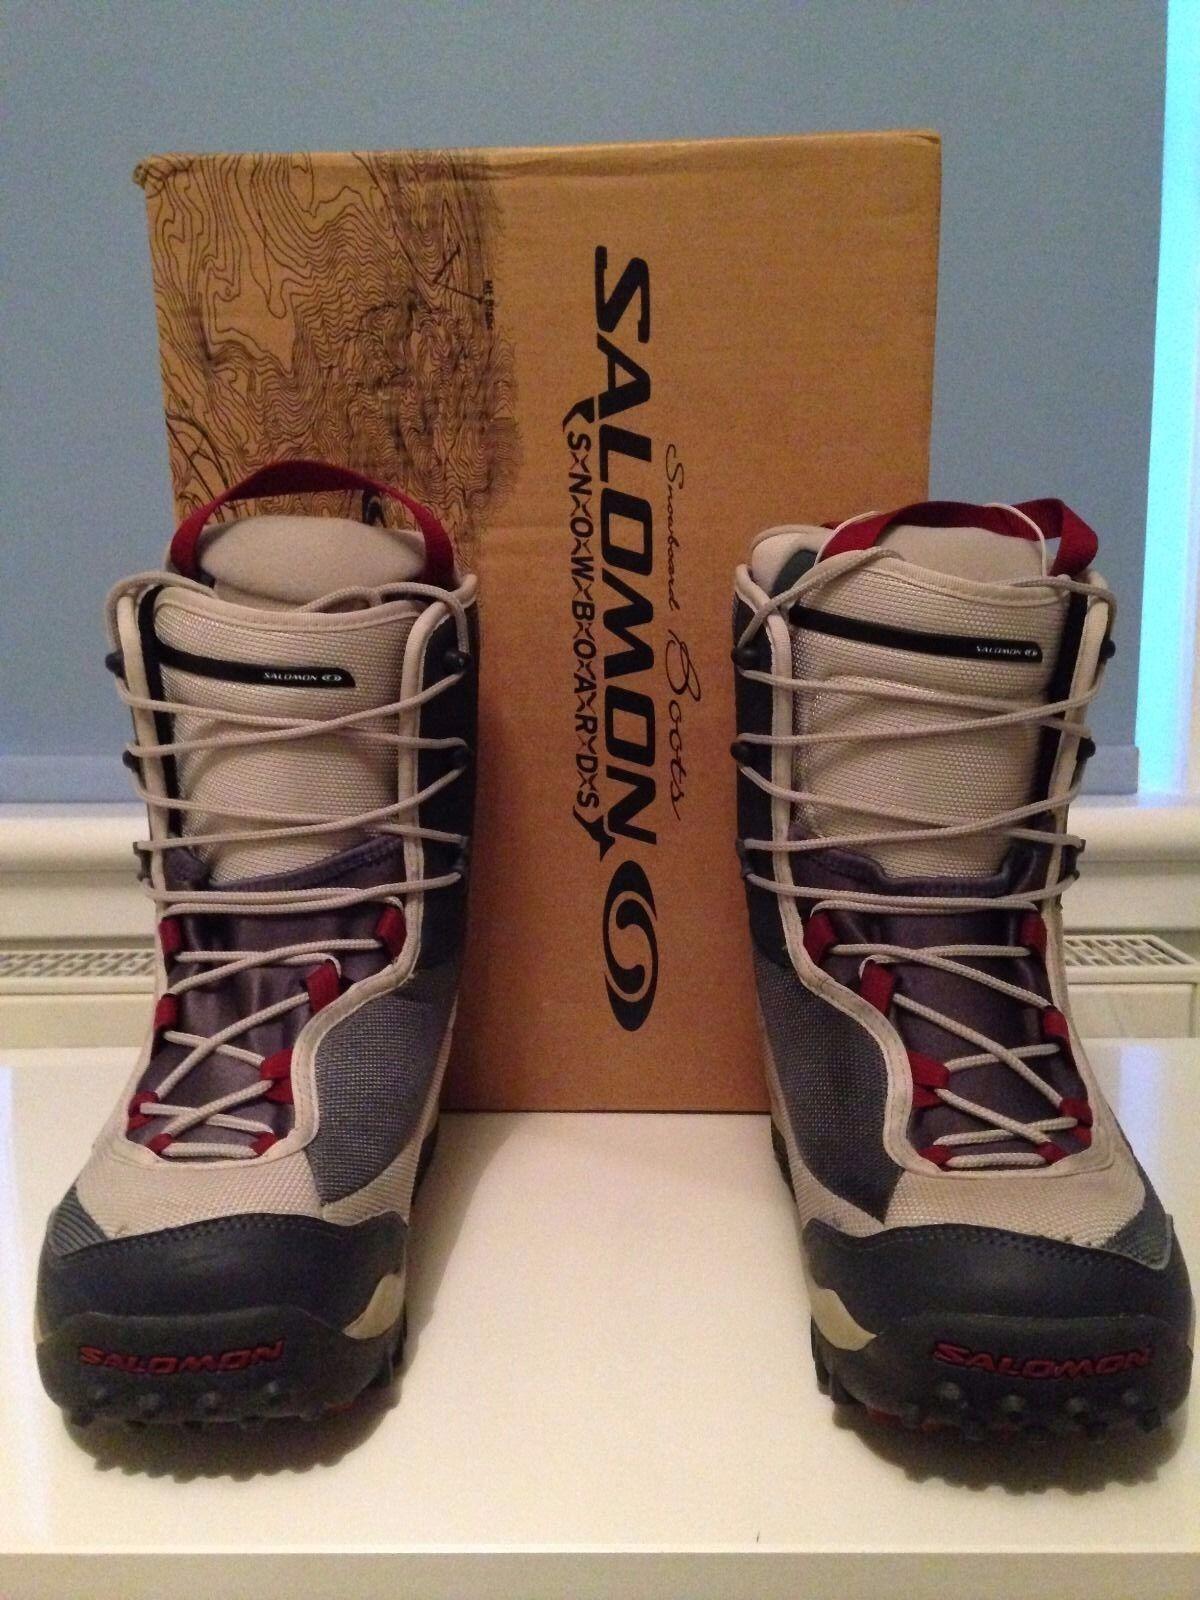 Salomon Diadem Snowboard Boots Women's Size Eur 41